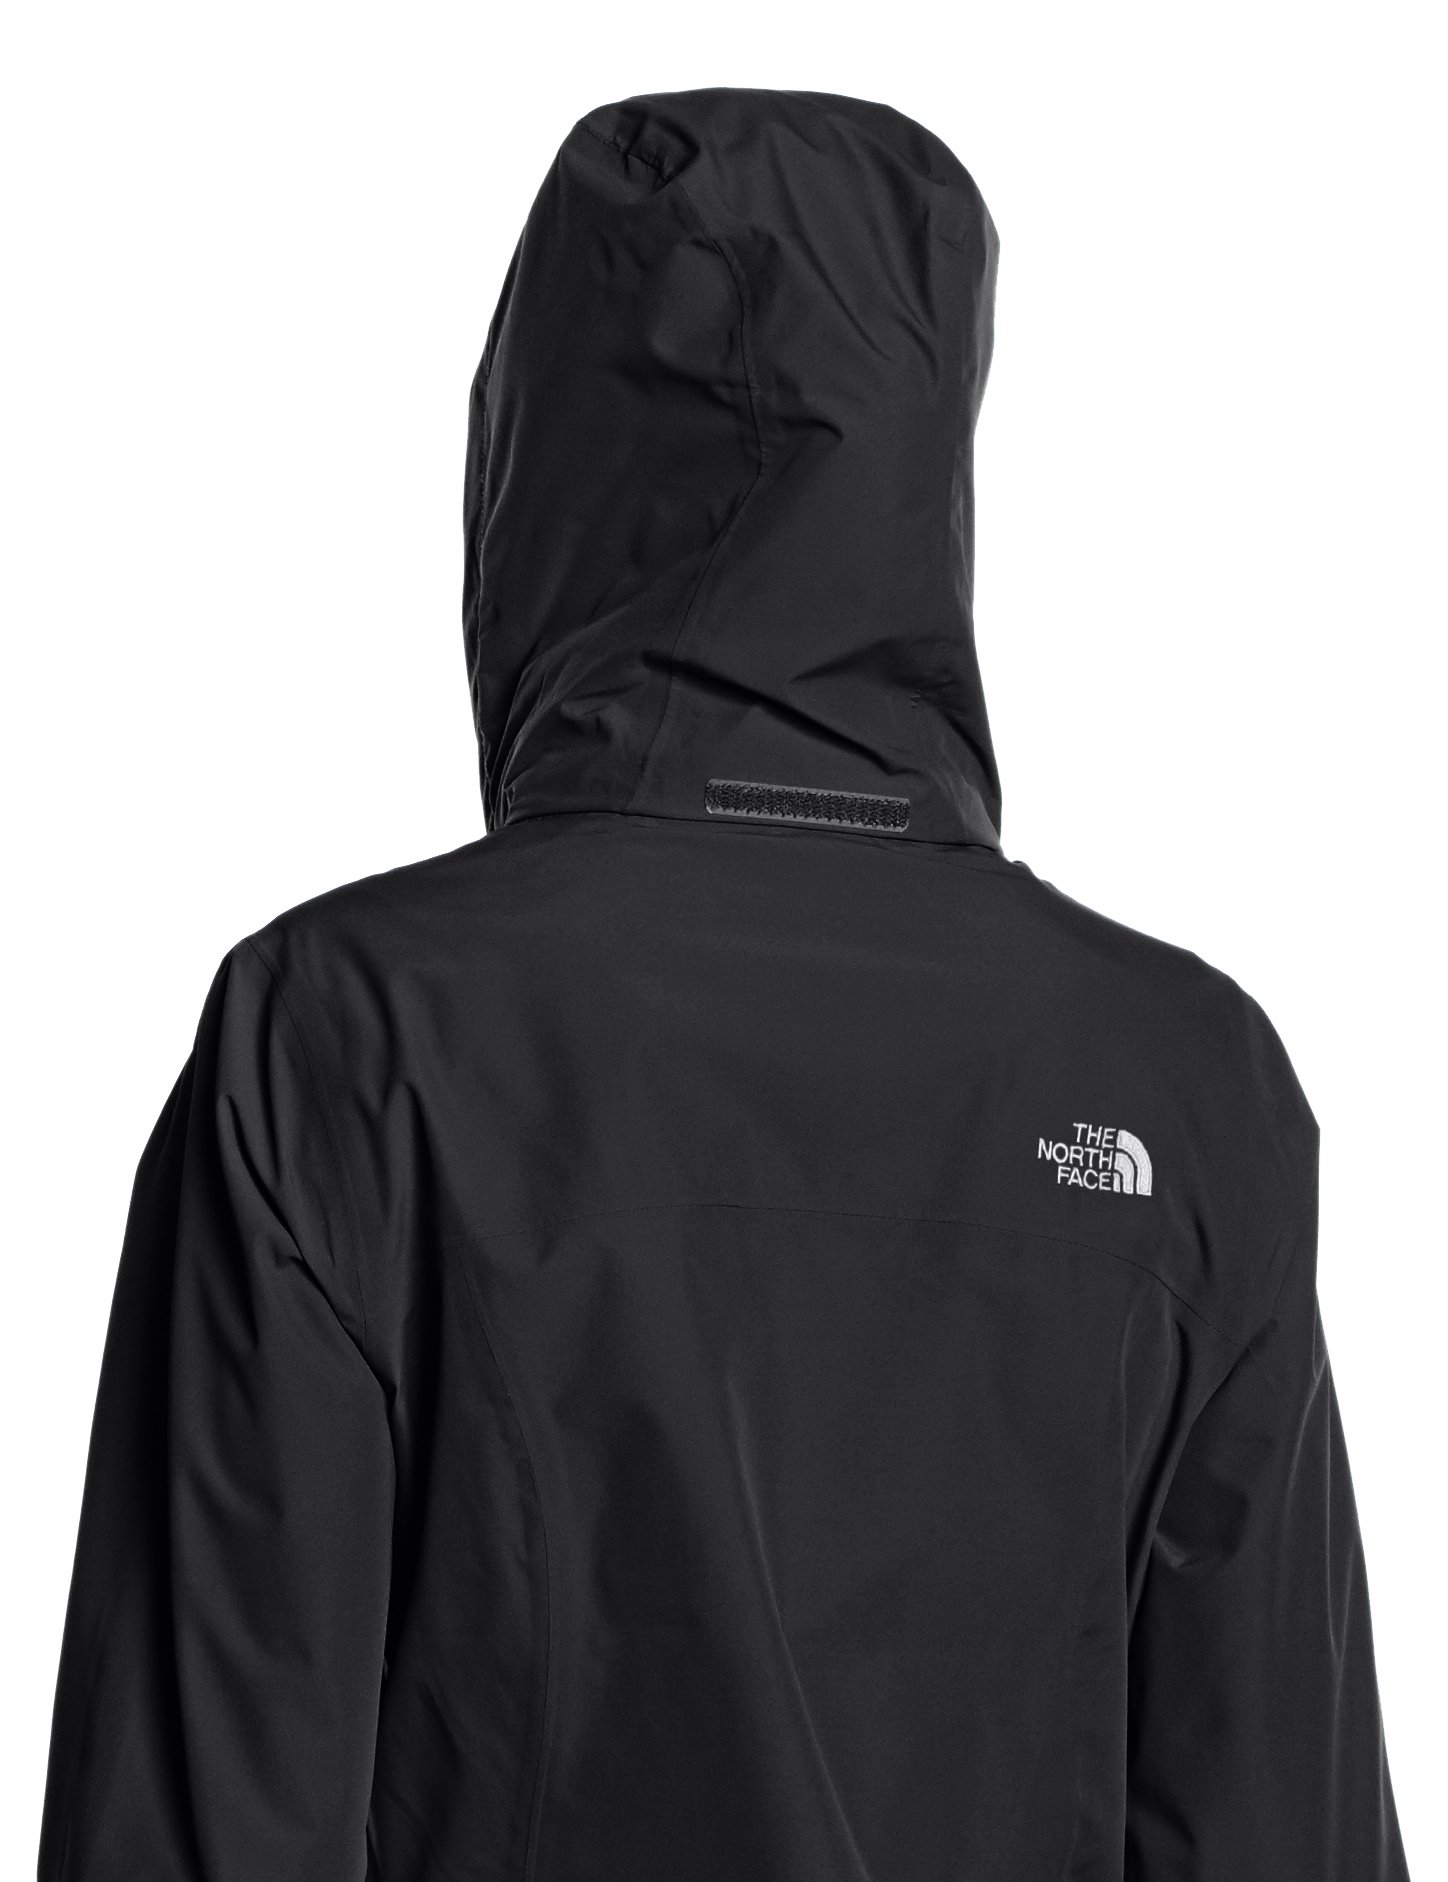 71HsrfPZQyL - The North Face Women's Sangro Outdoor Jacket